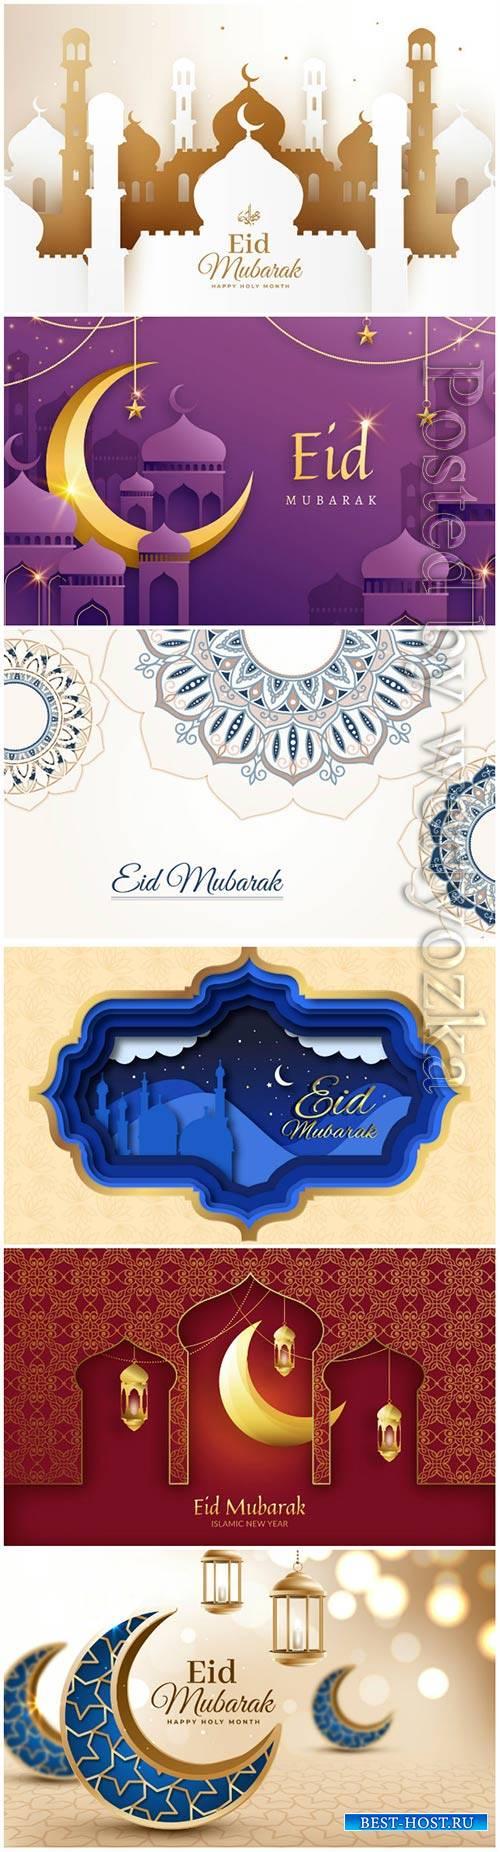 Happy eid mubarak vector design background # 3